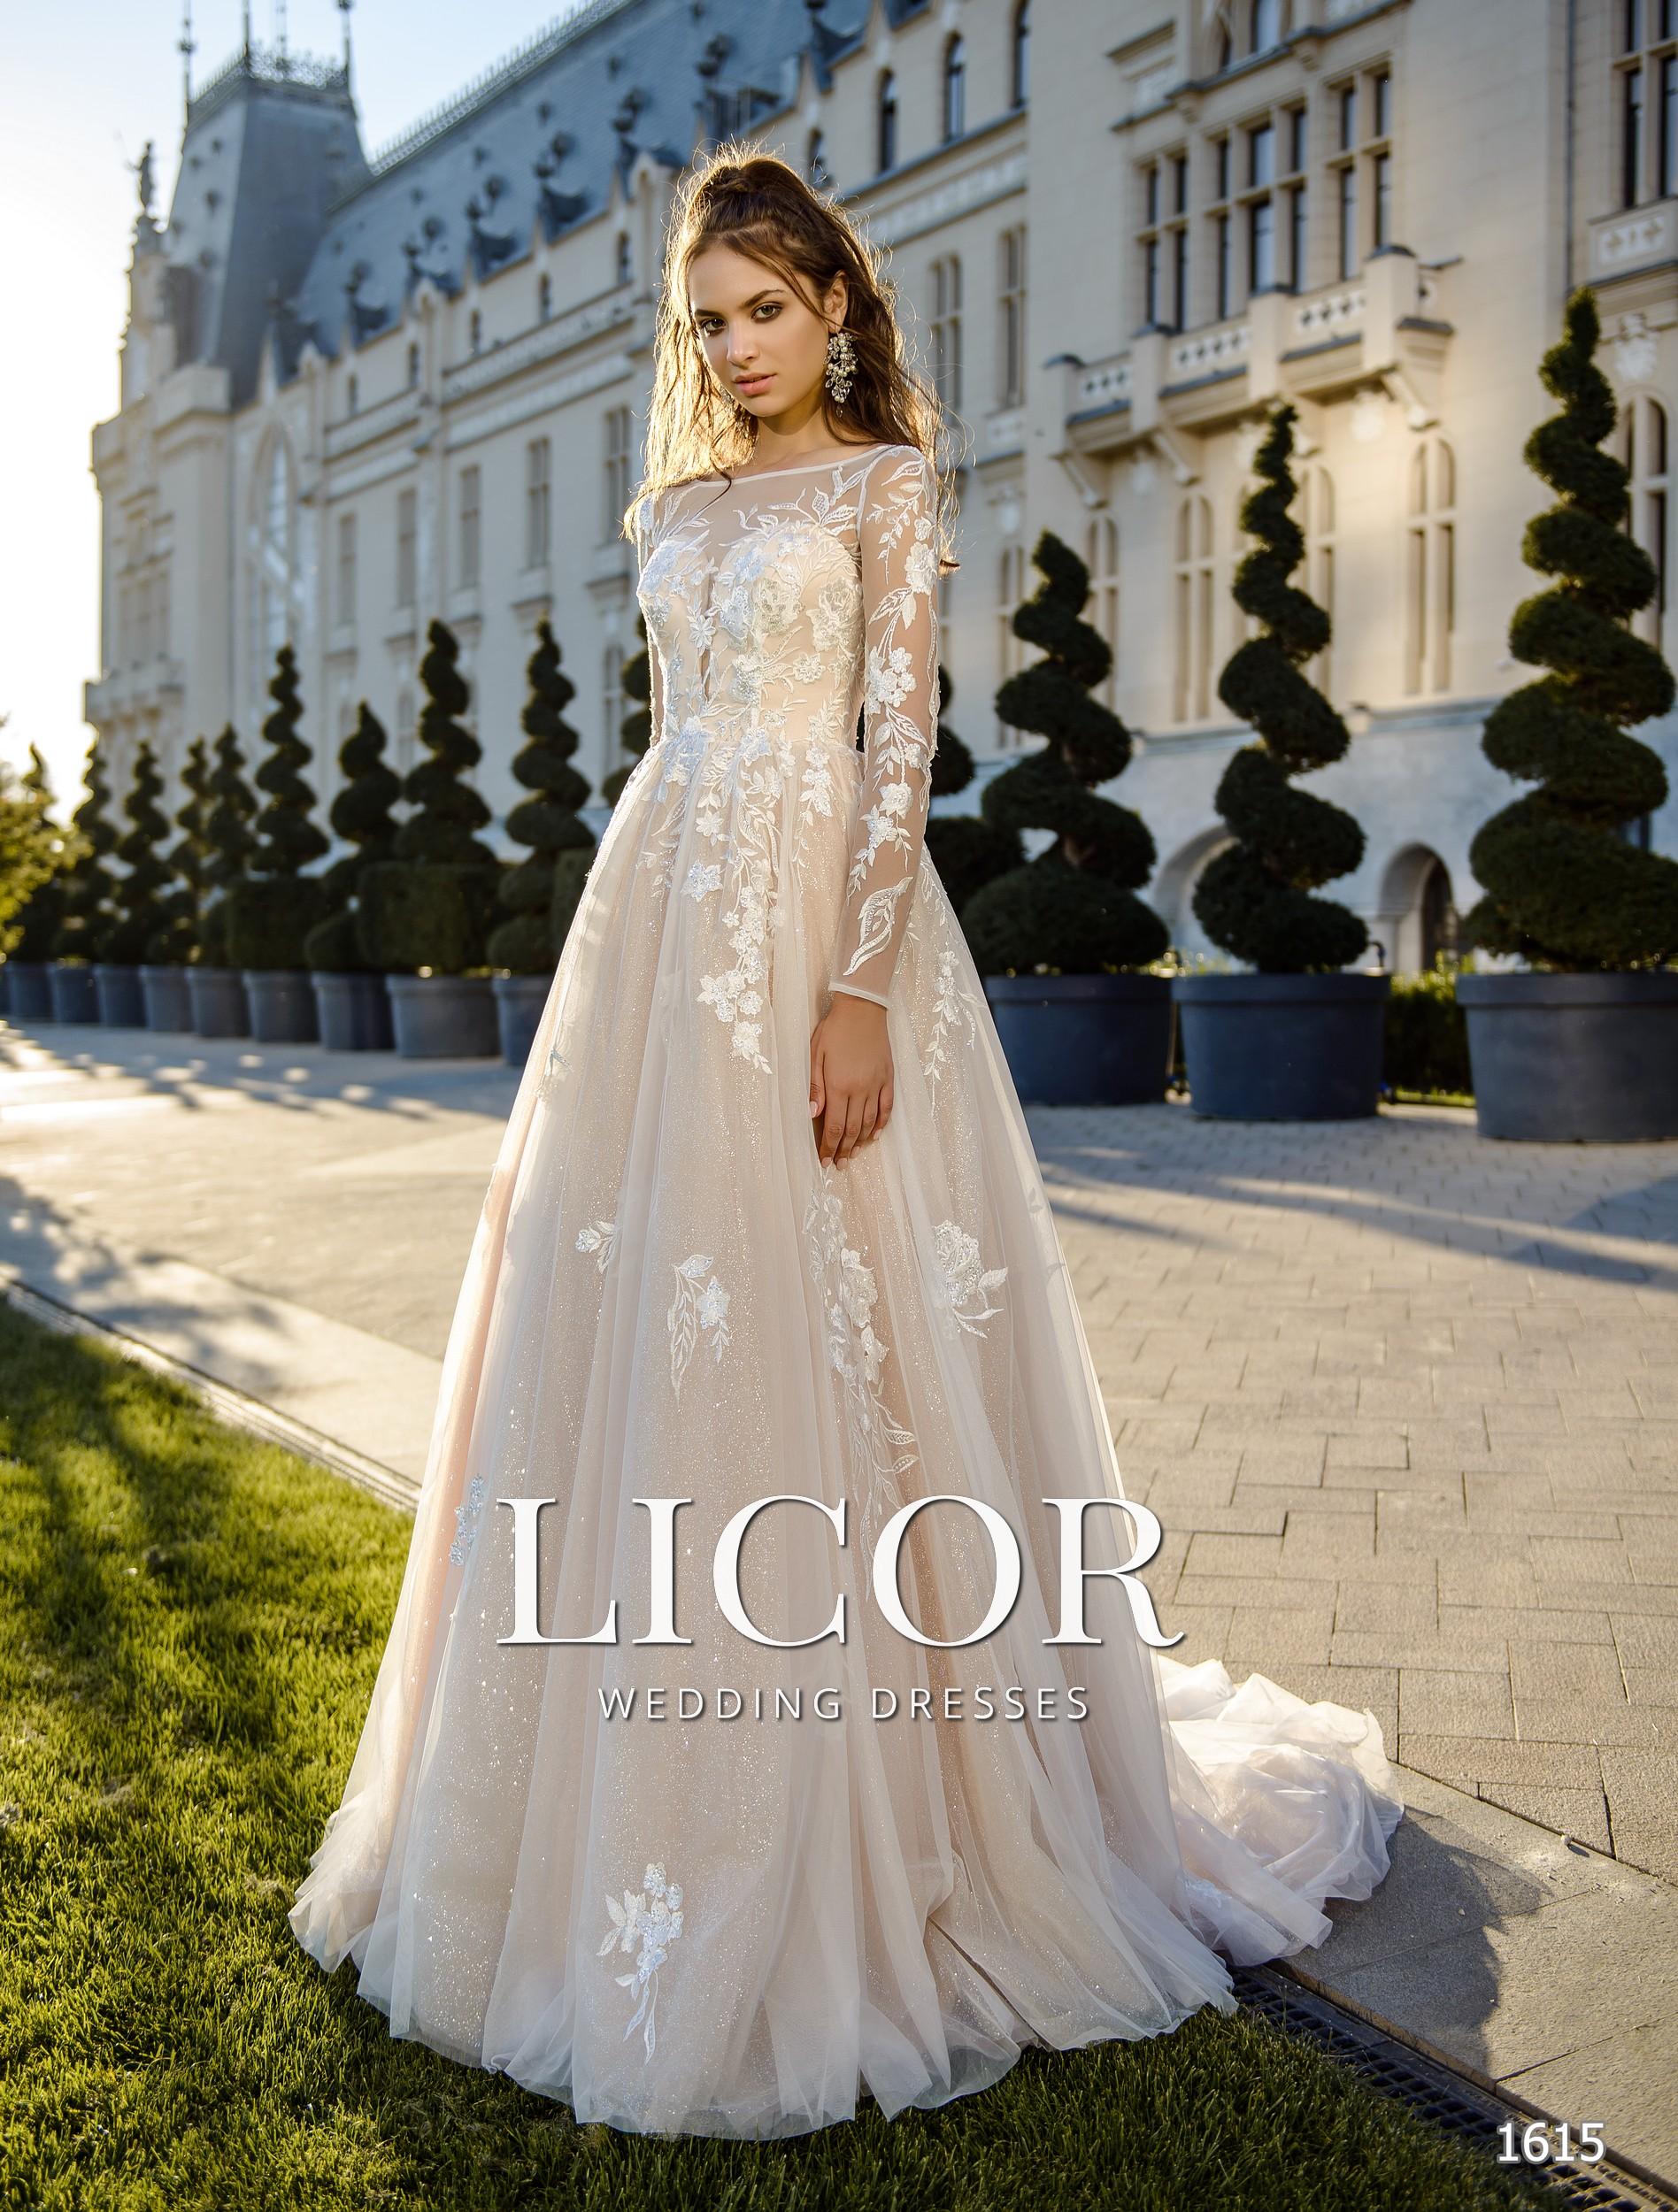 http://licor.com.ua/images/stories/virtuemart/product/1615(1).jpg